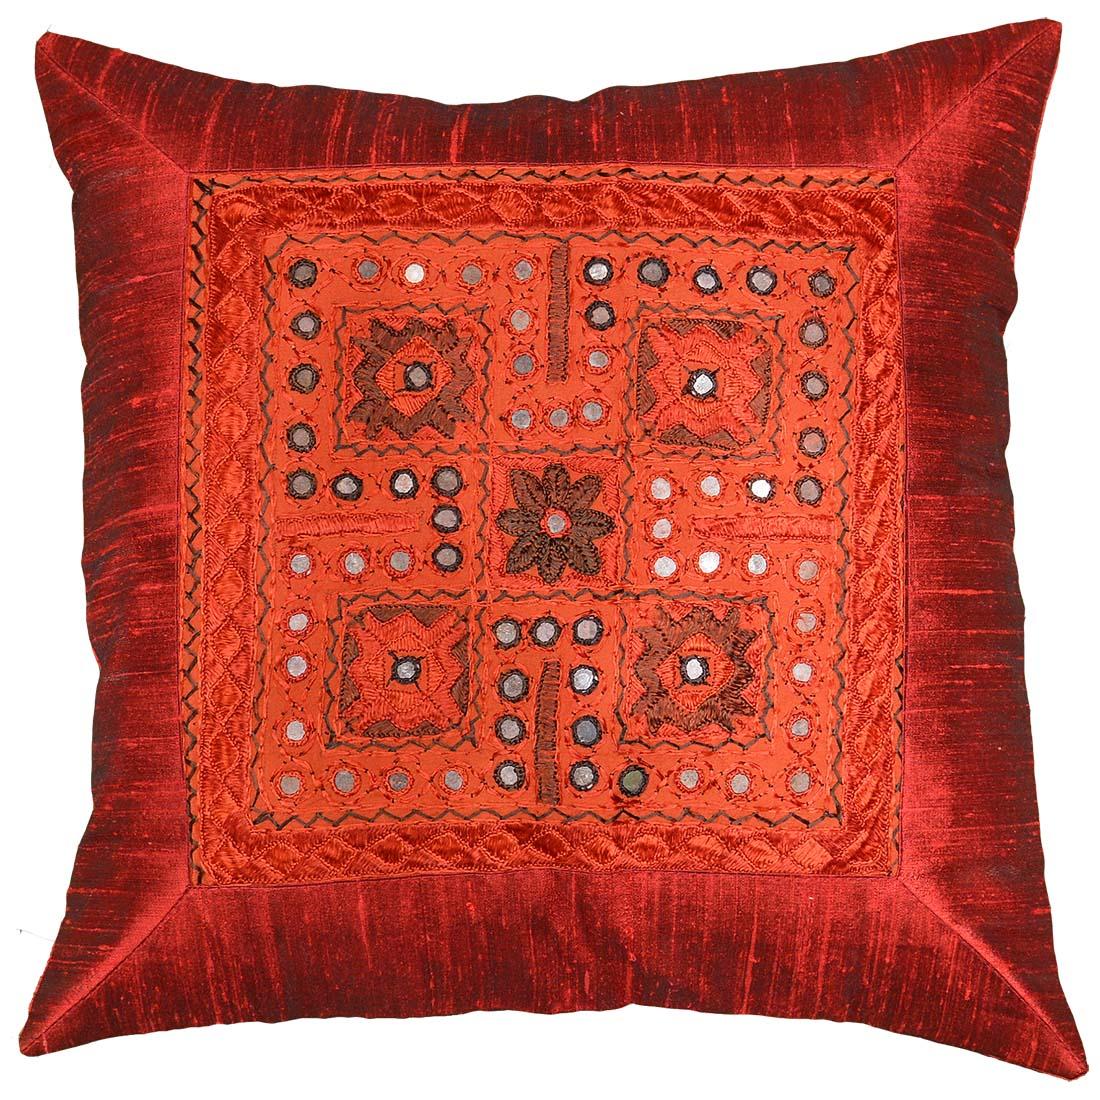 designer sofa pillows house of fraser linea bed silk burgundy red accent zardozi pillow cover 16 quot x